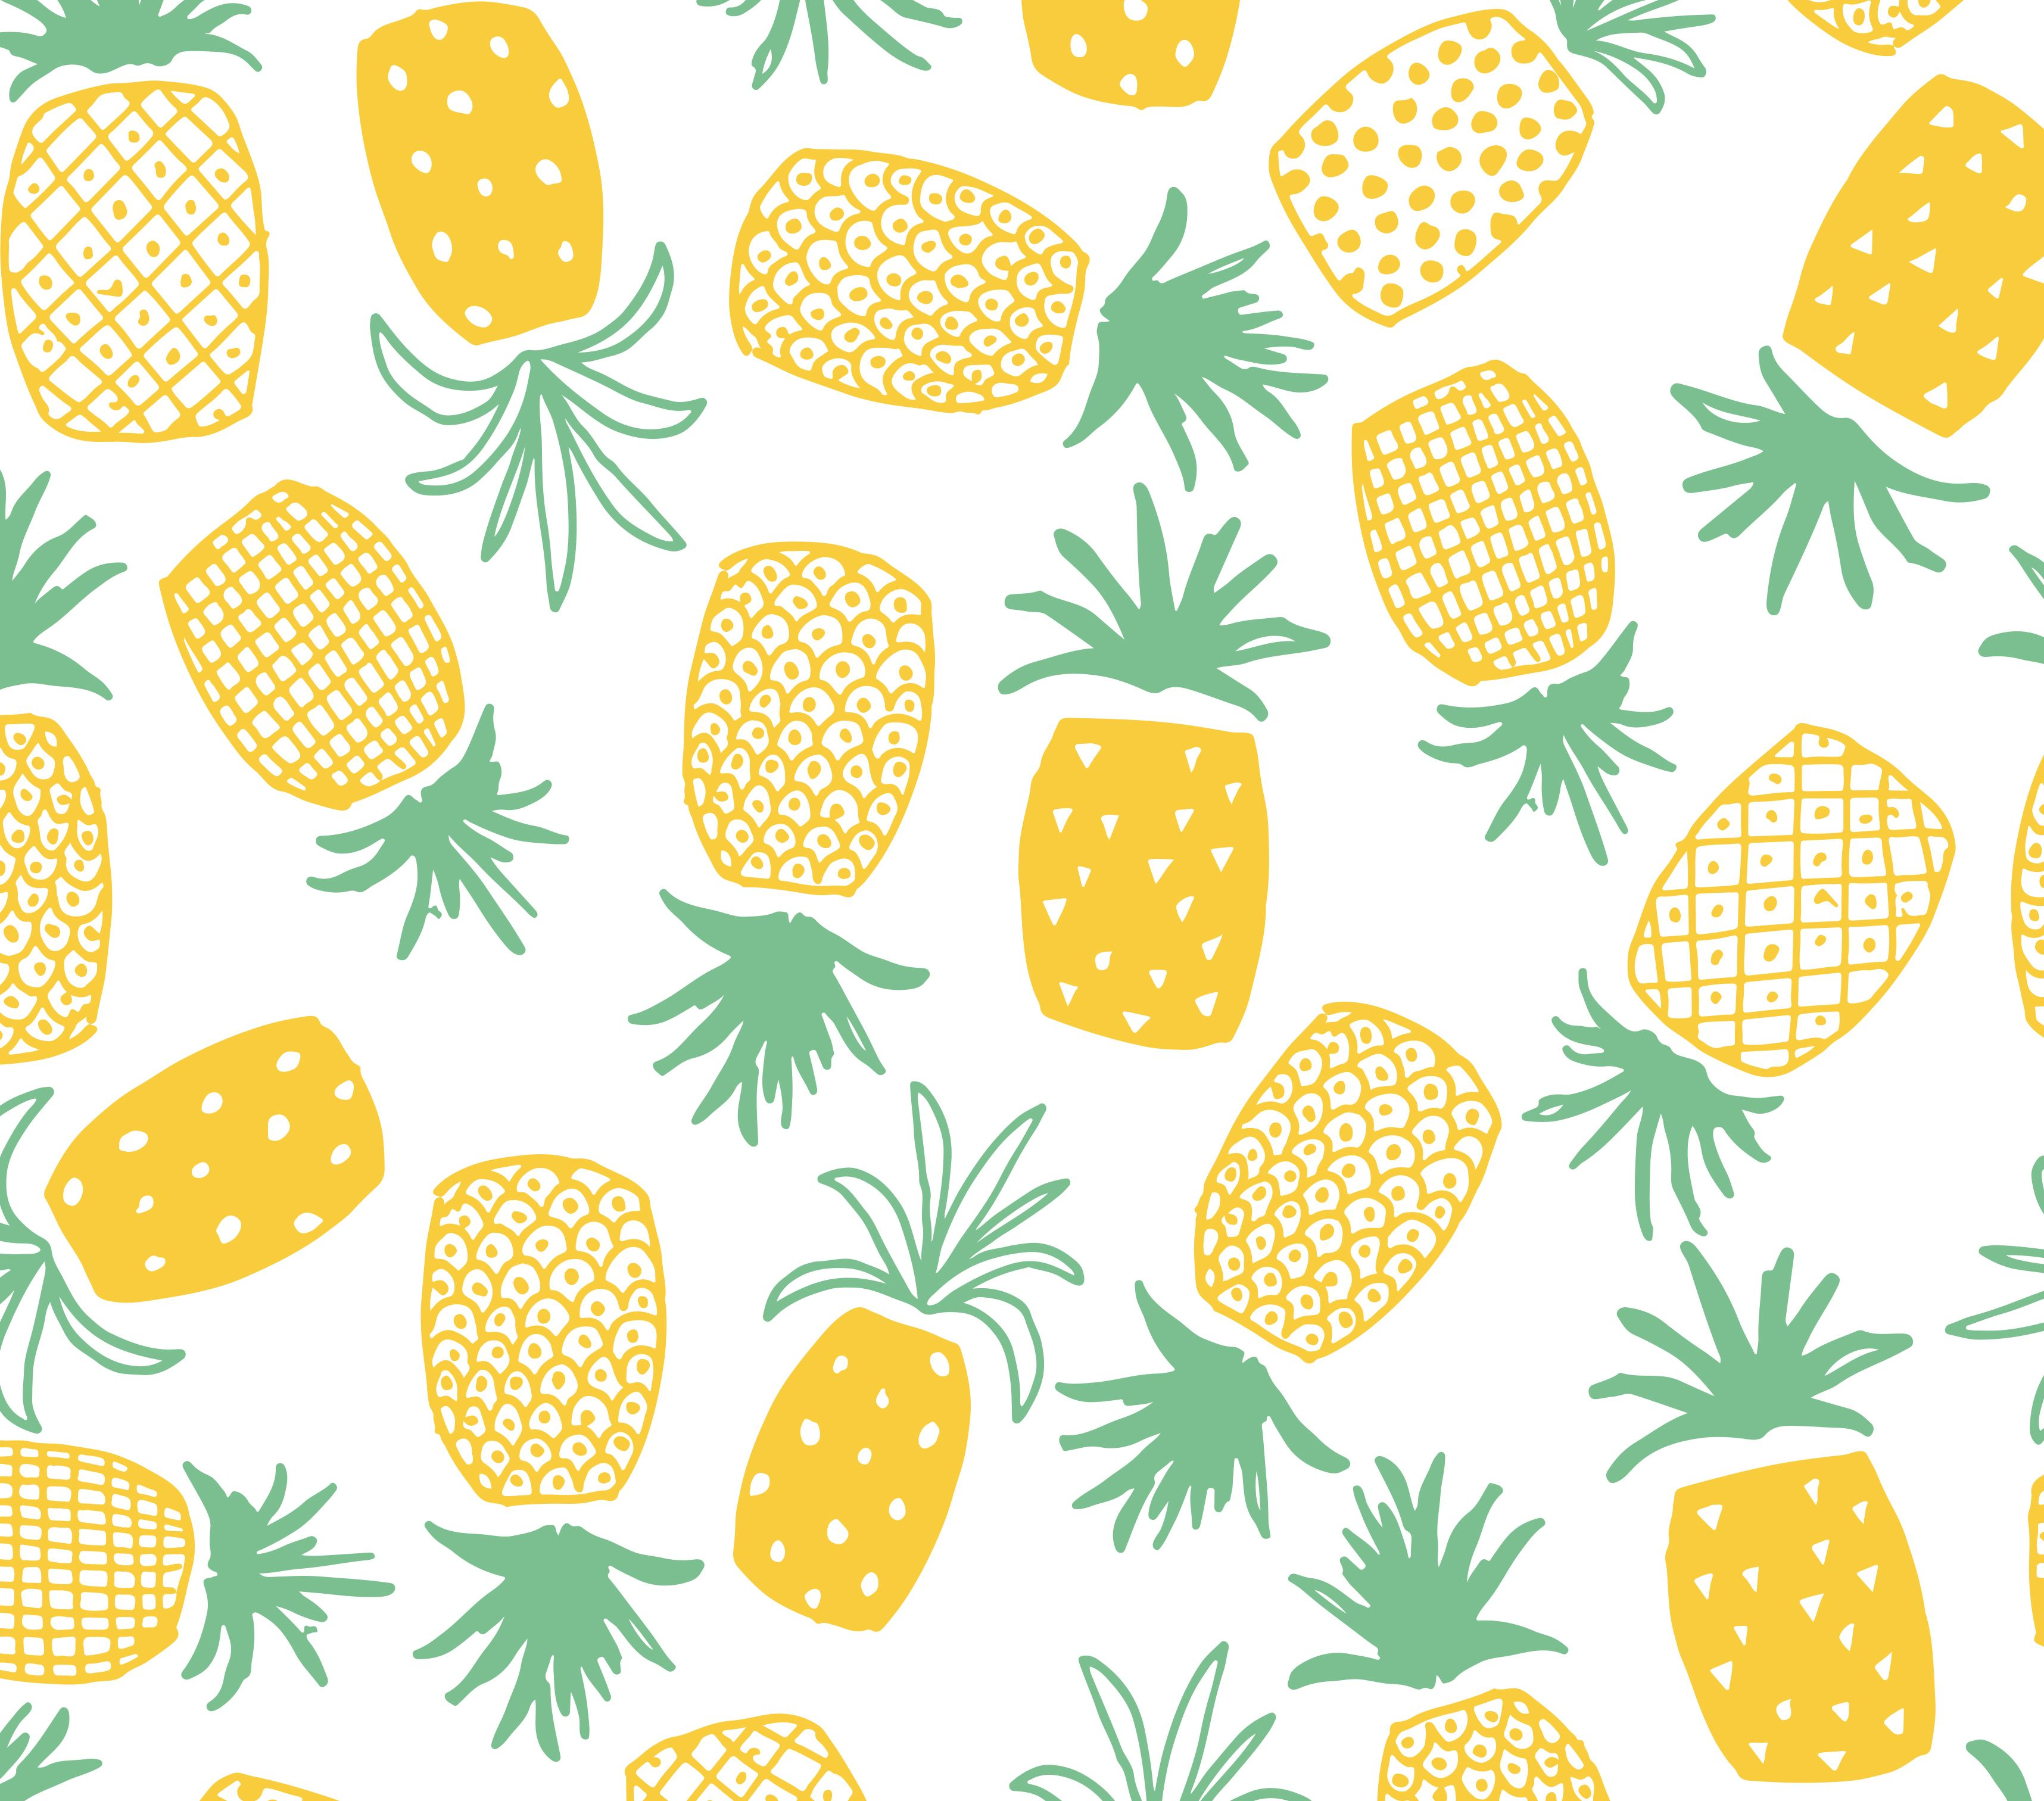 Pineapple Print Seamless Pattern Patterns Printing And